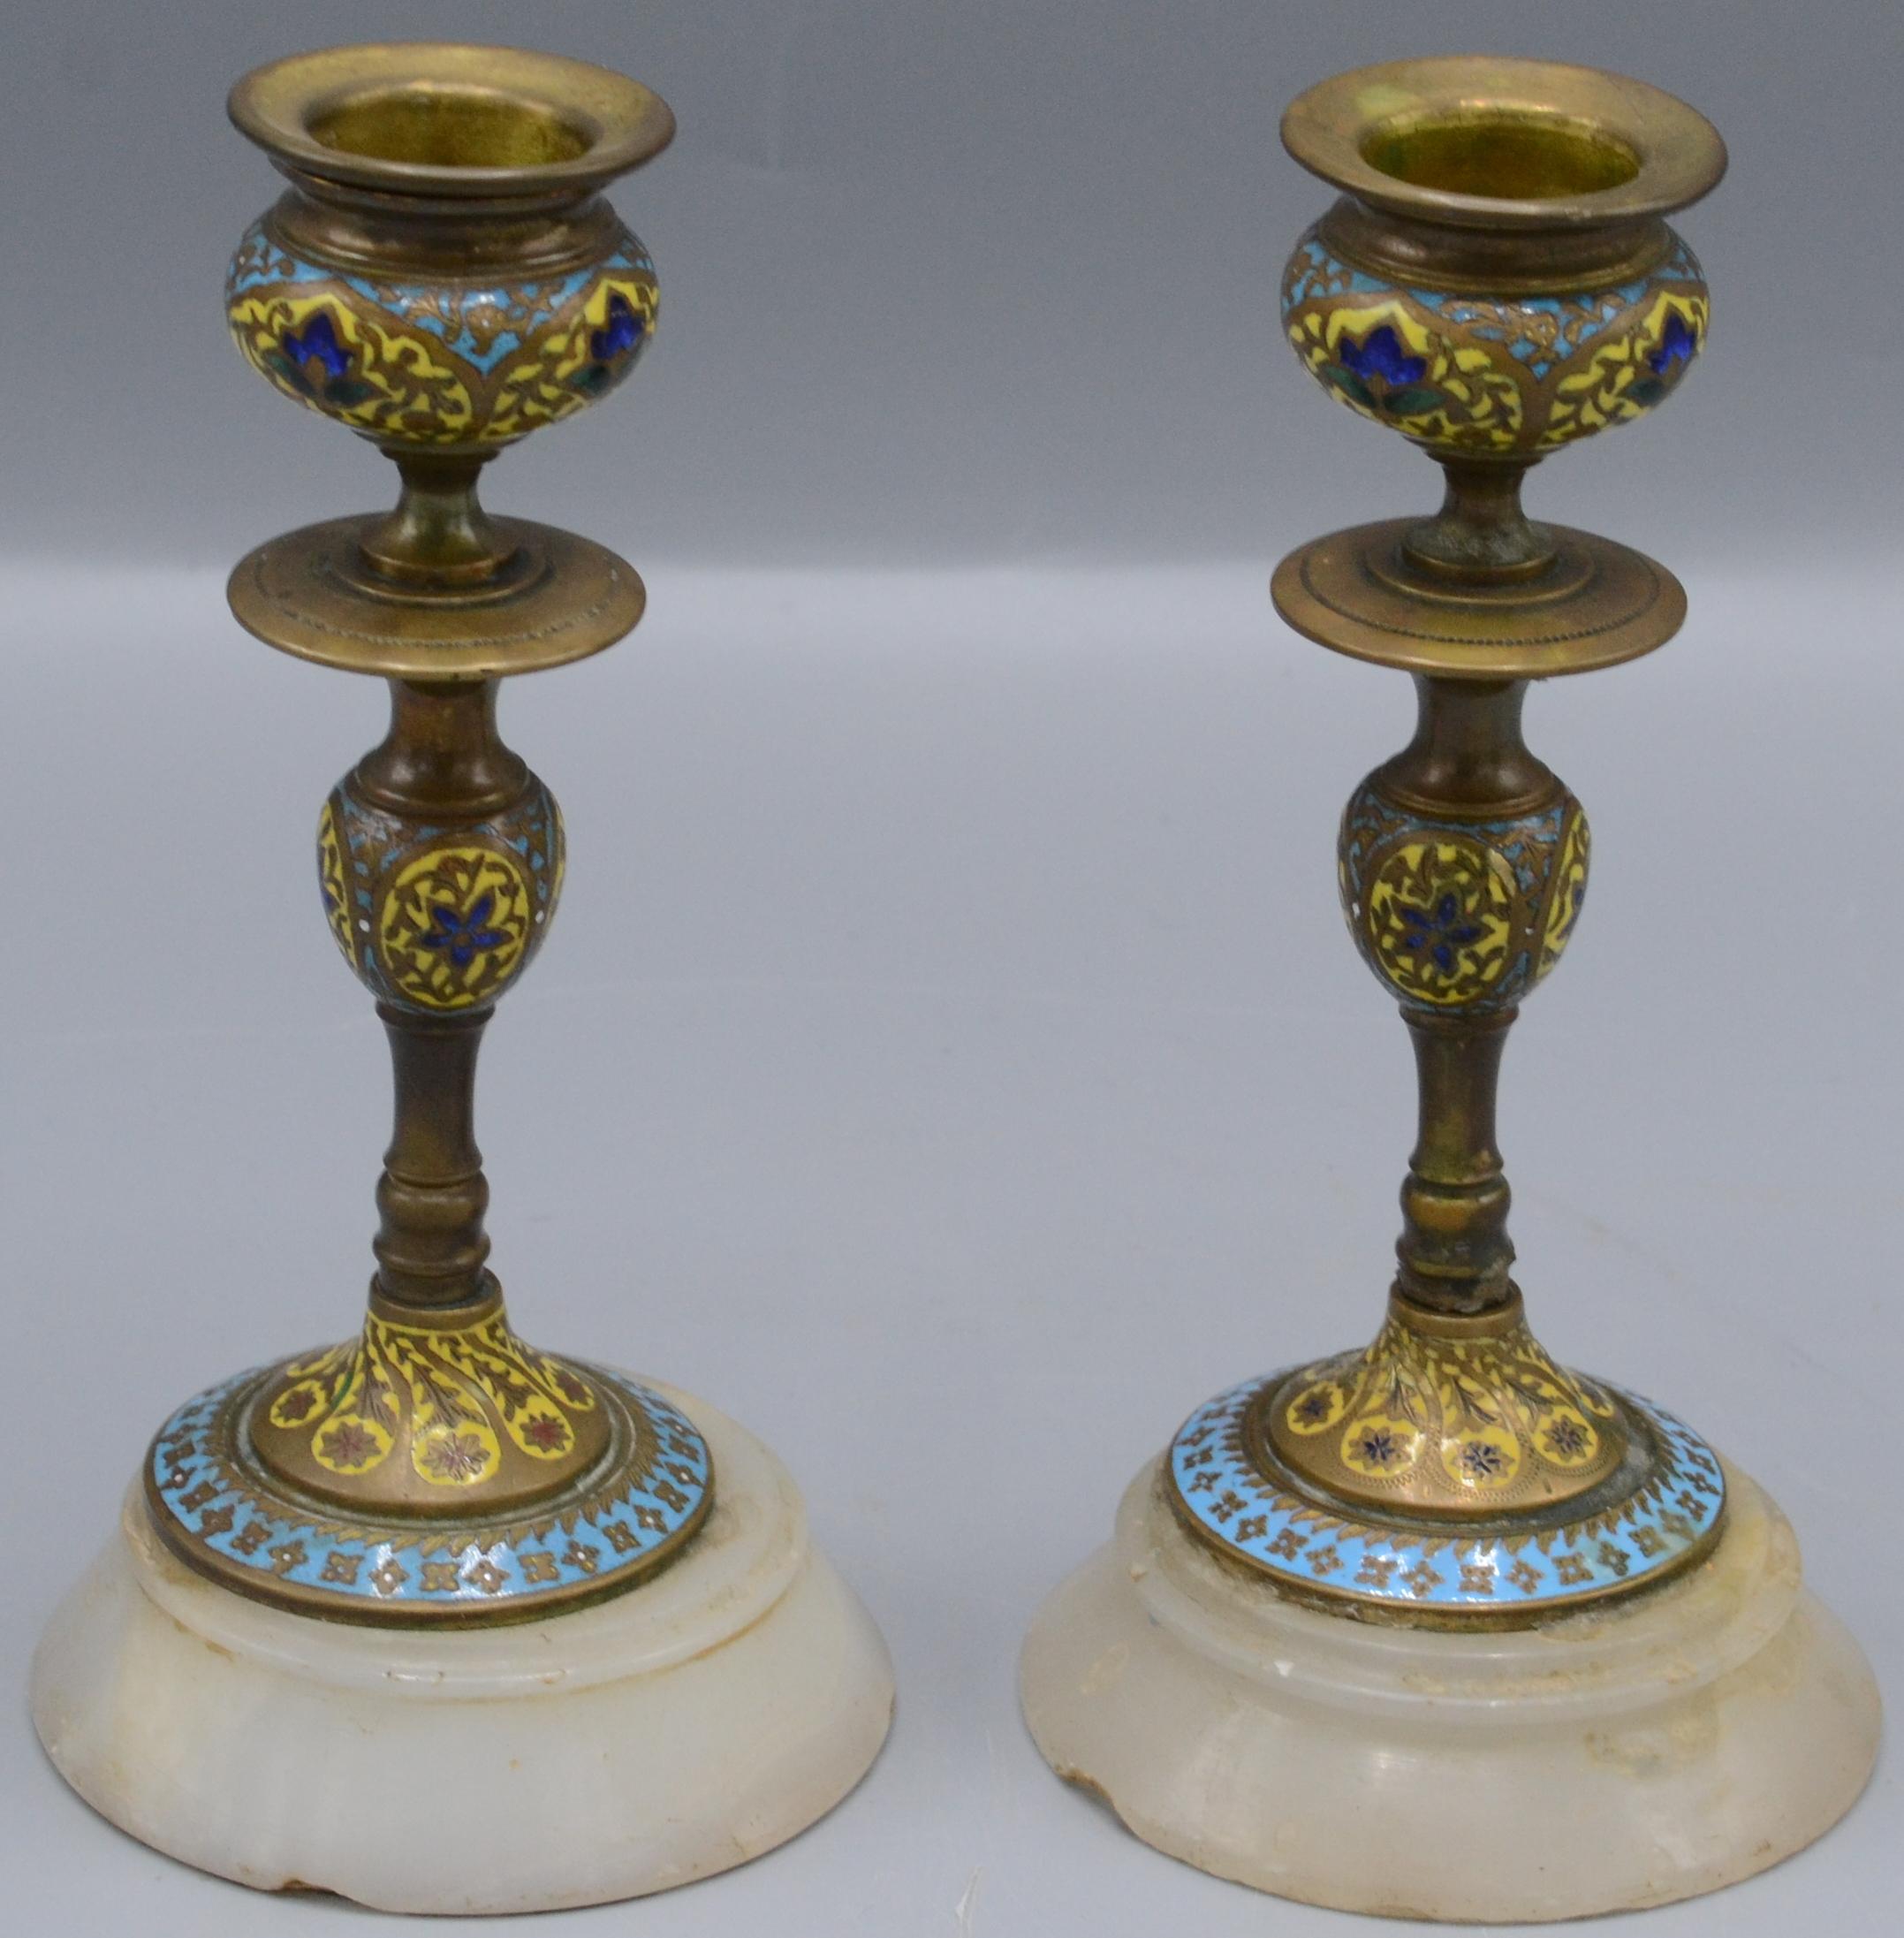 Lot 59 - A pair of continental champleve enamel candlesticks, circa 1900, height 14.5cm, diameter 7.3cm.